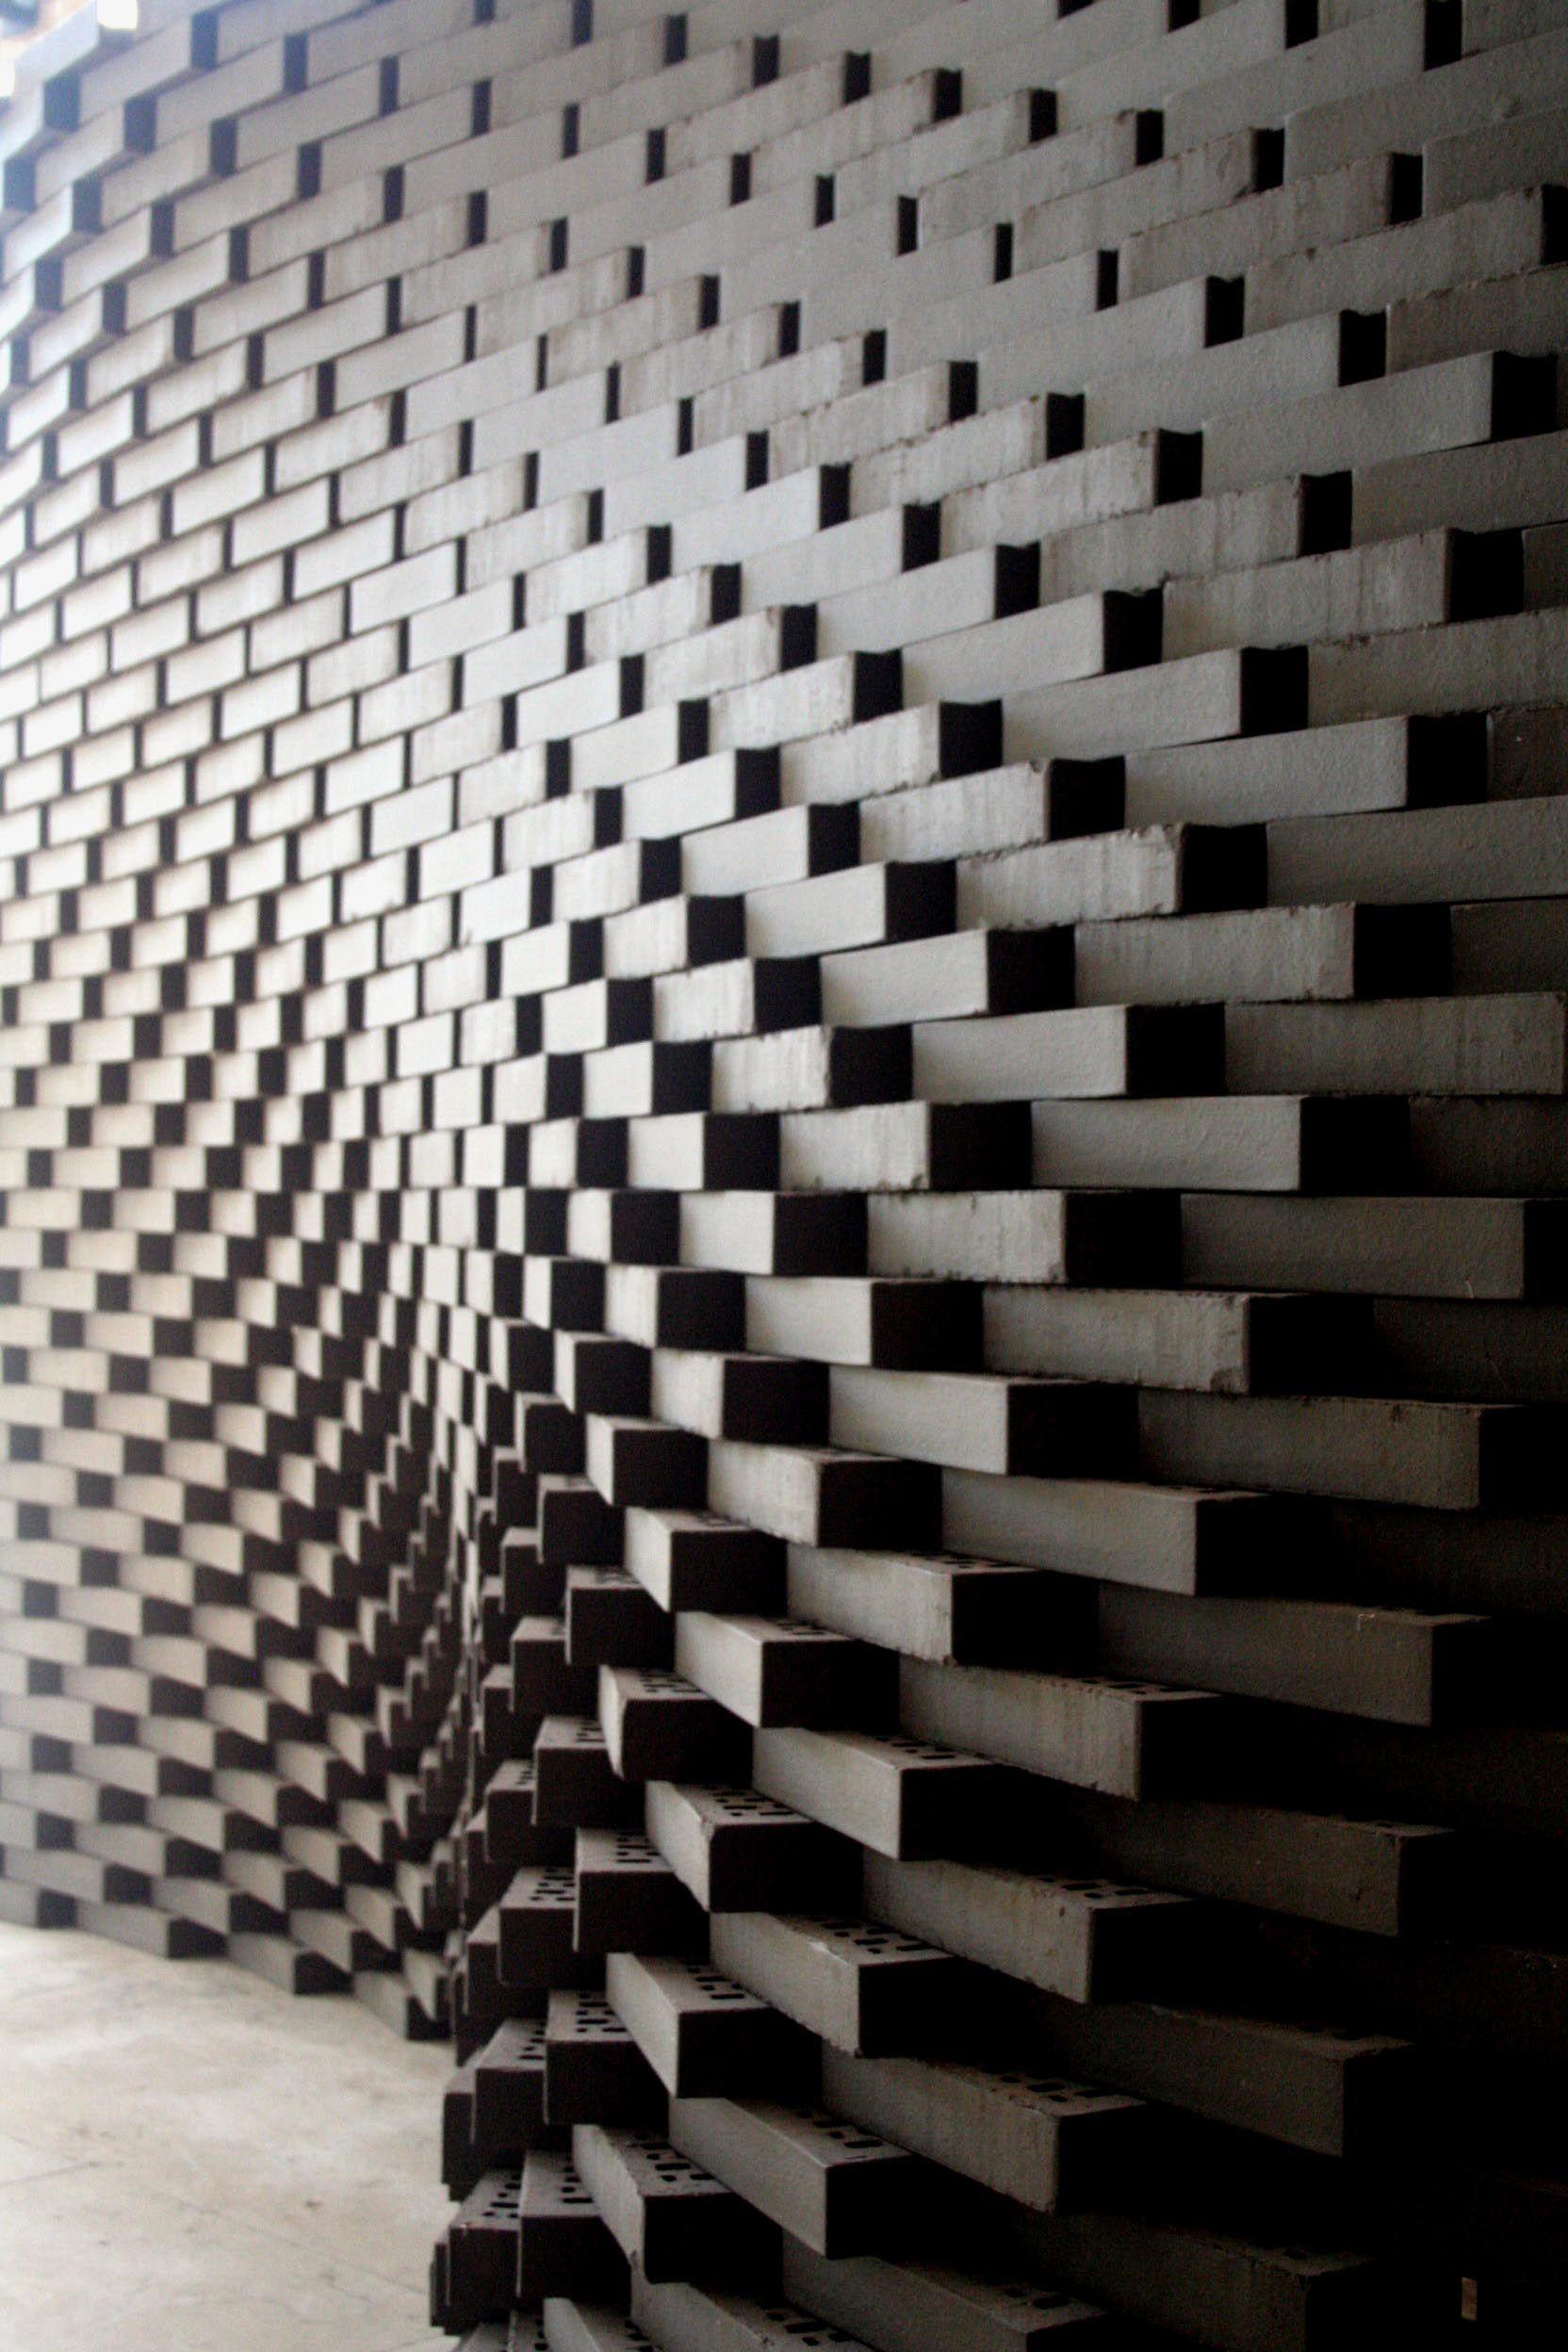 Interior Design : Materials/patterns